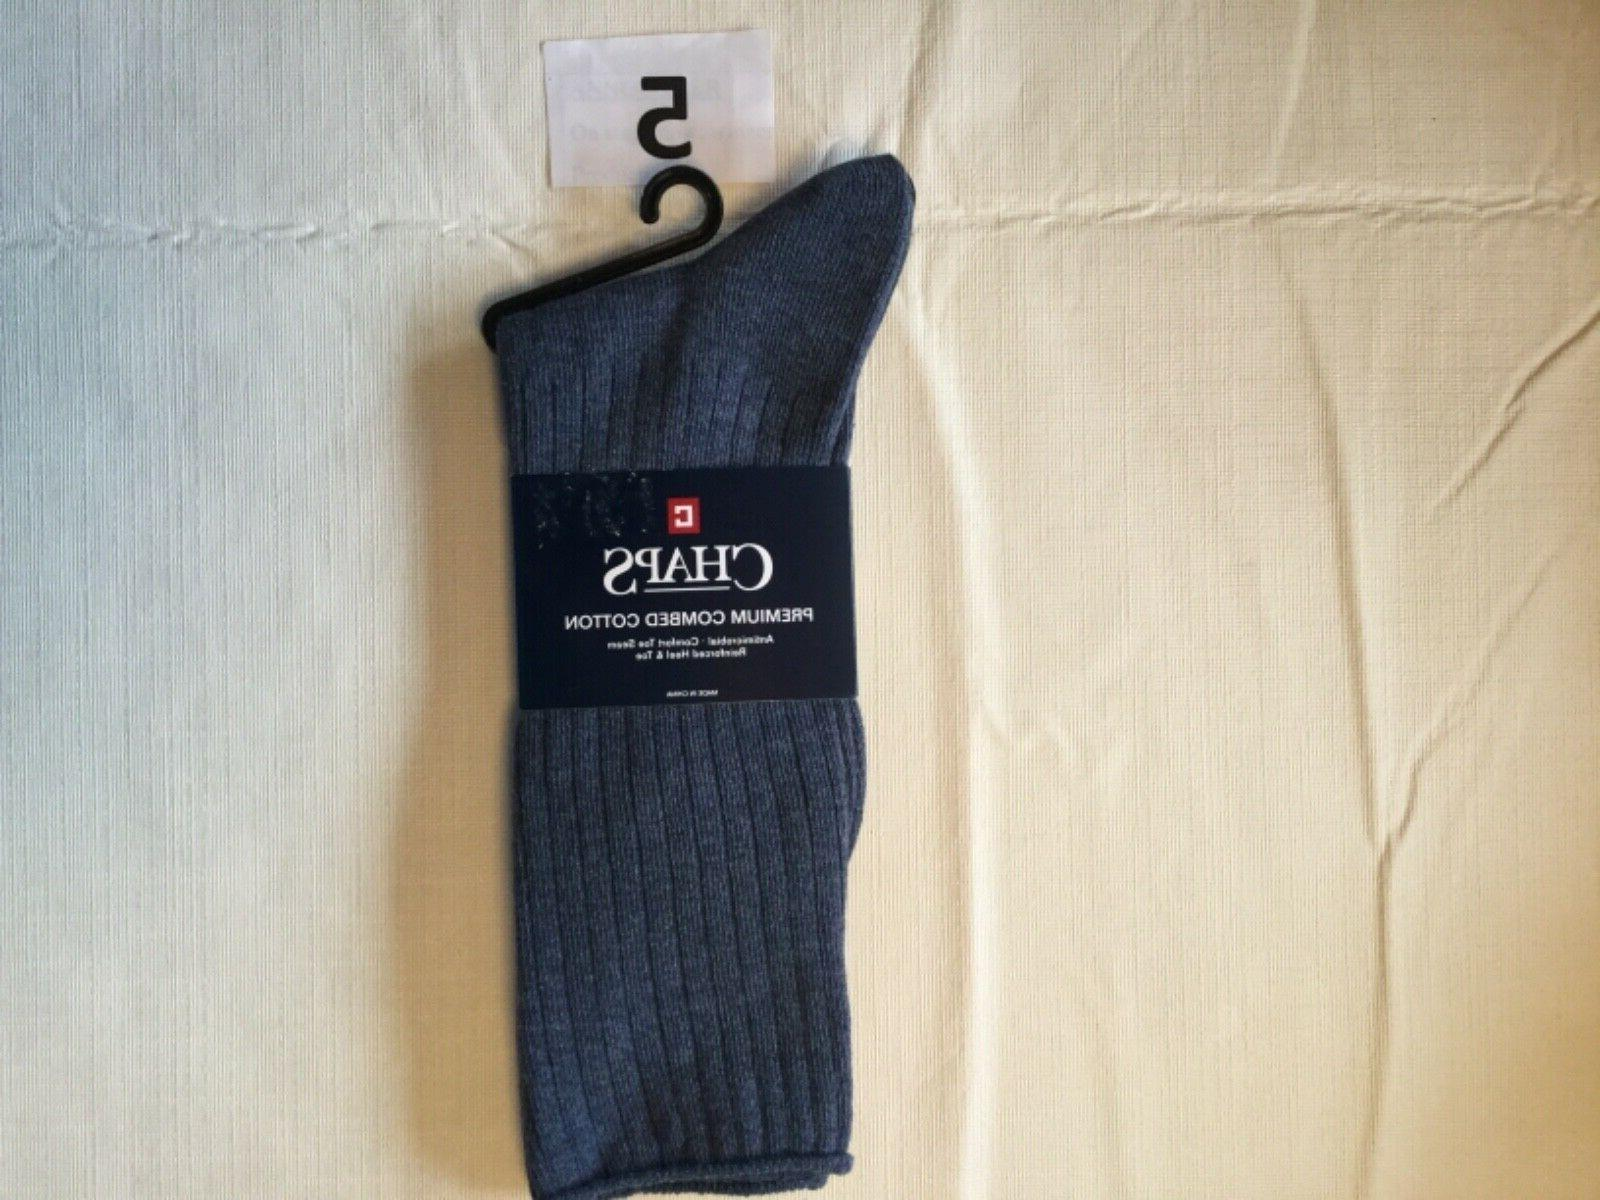 Chaps Socks Antimicrobial New Tag Green Gray